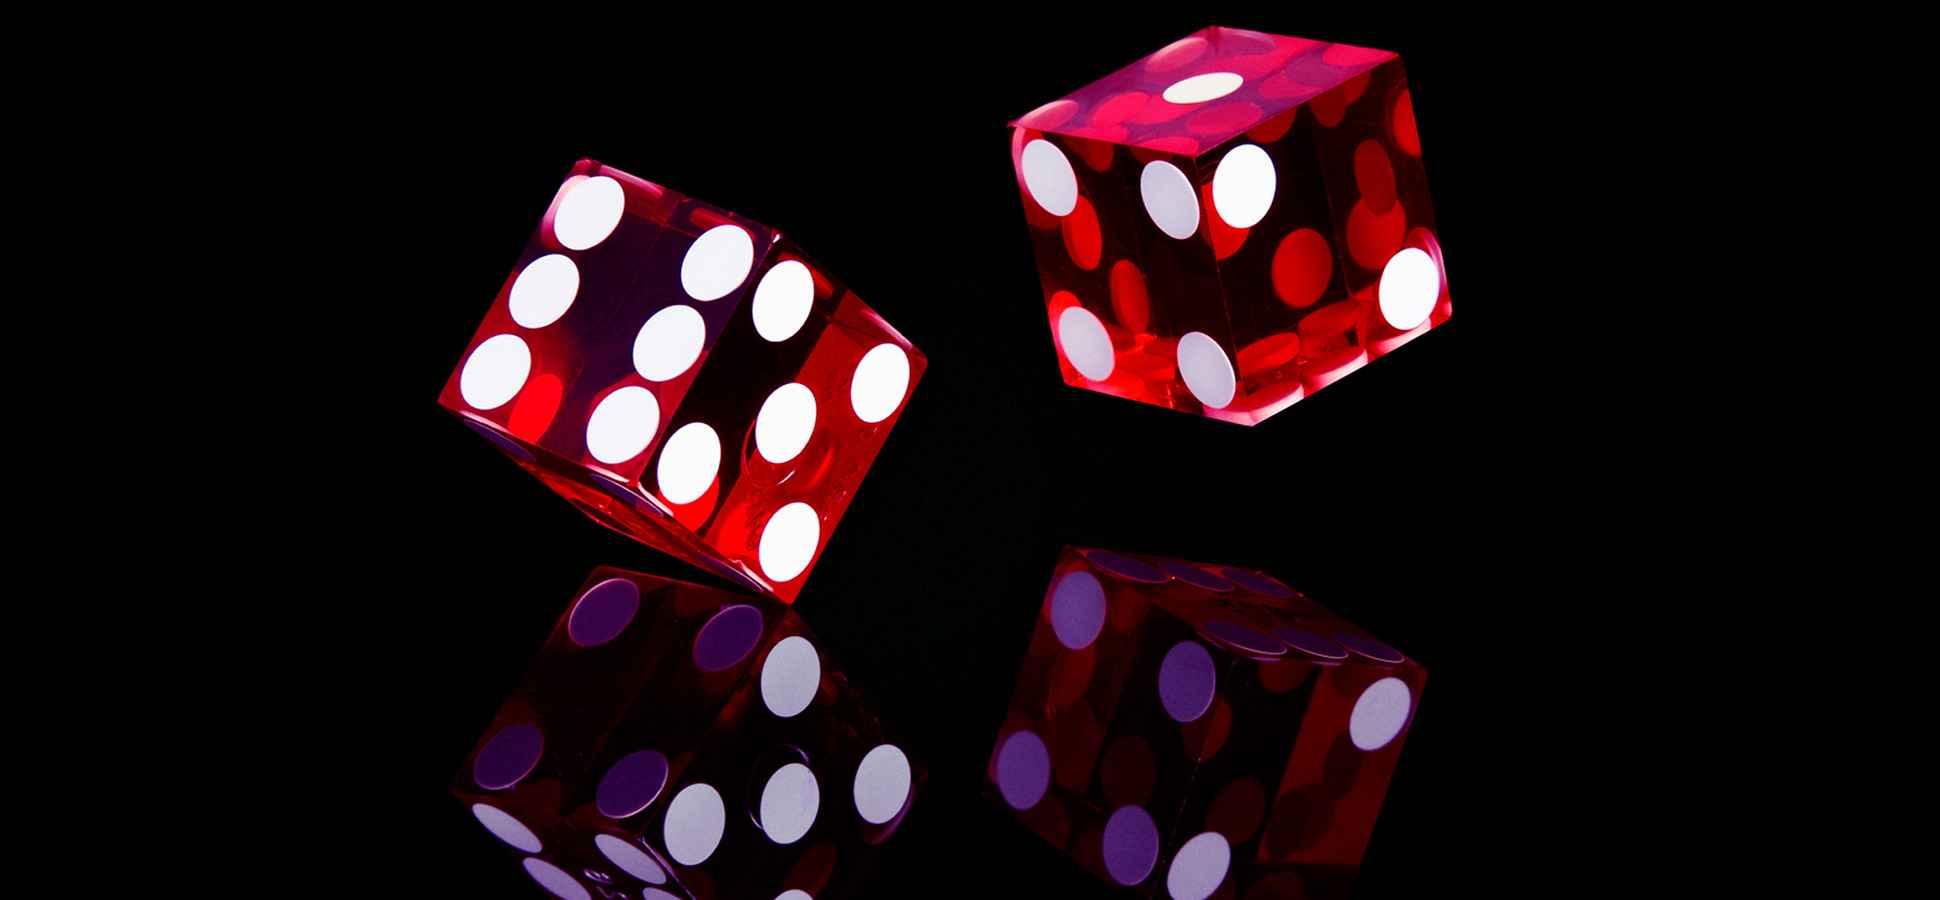 3 Decision-Making Pitfalls to Avoid